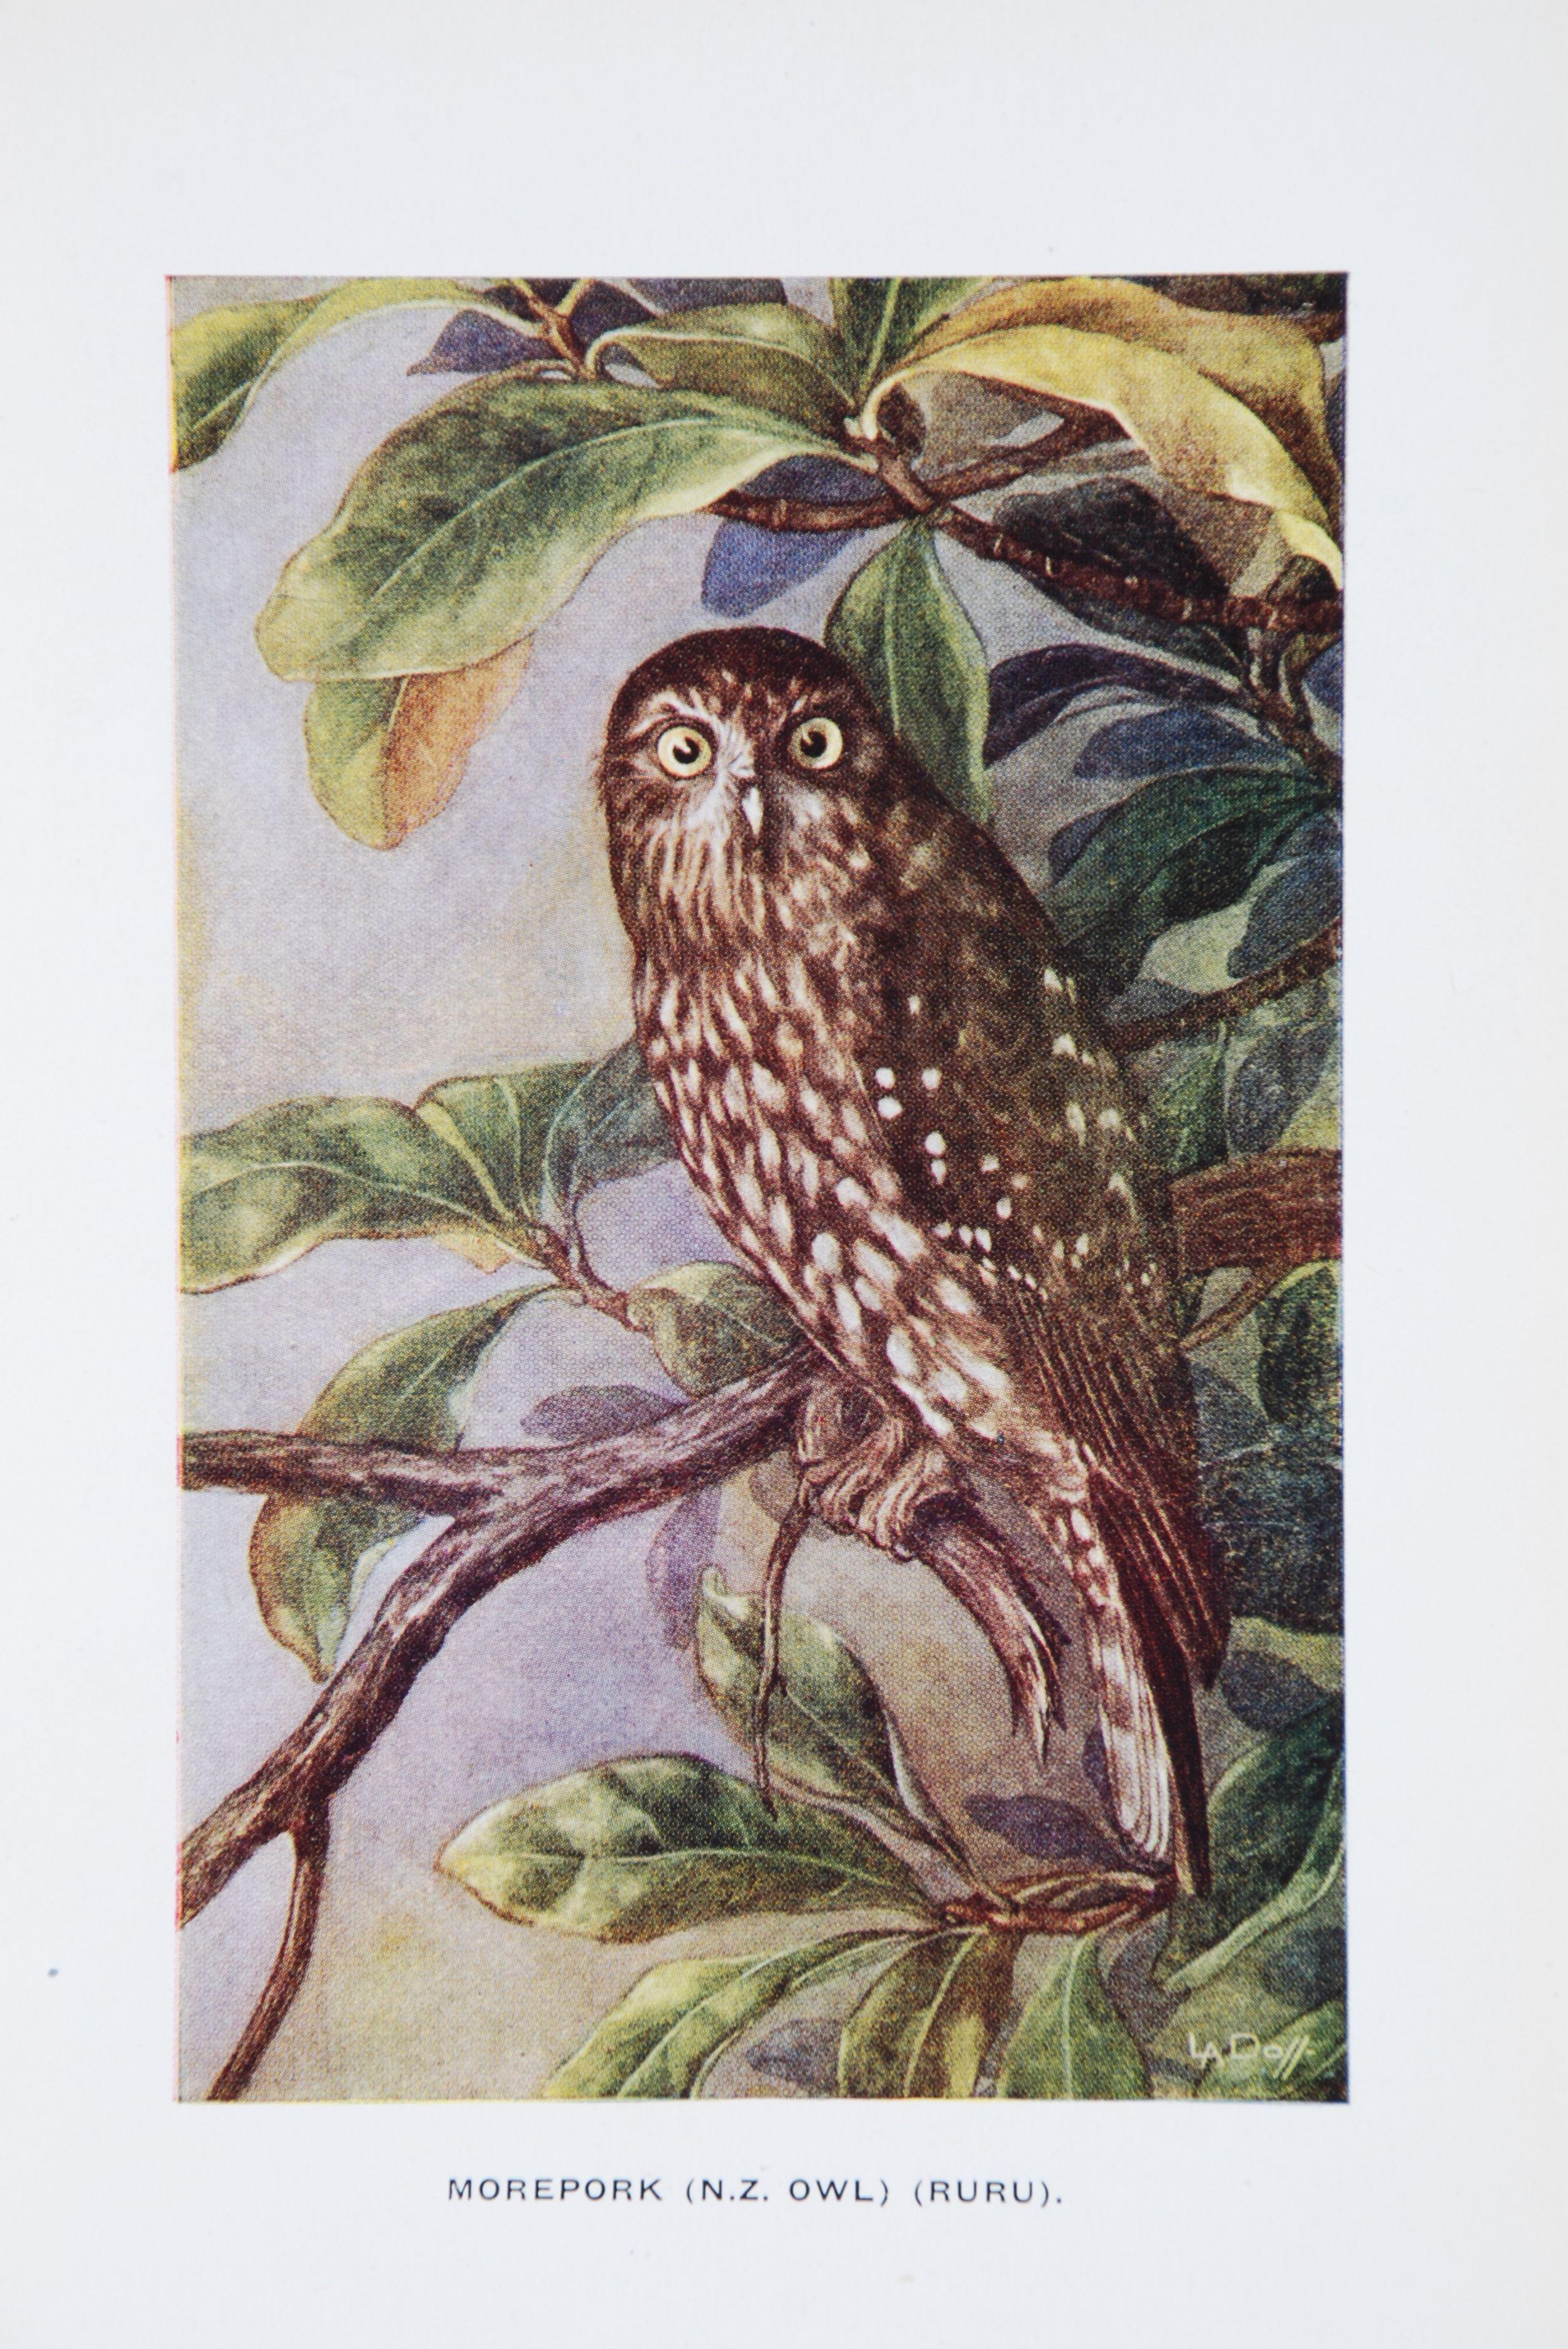 Olga Pauline Burton. Stories of bird and bush. Auckland, N.Z.: Oswald-Sealy (New Zealand), [1943].